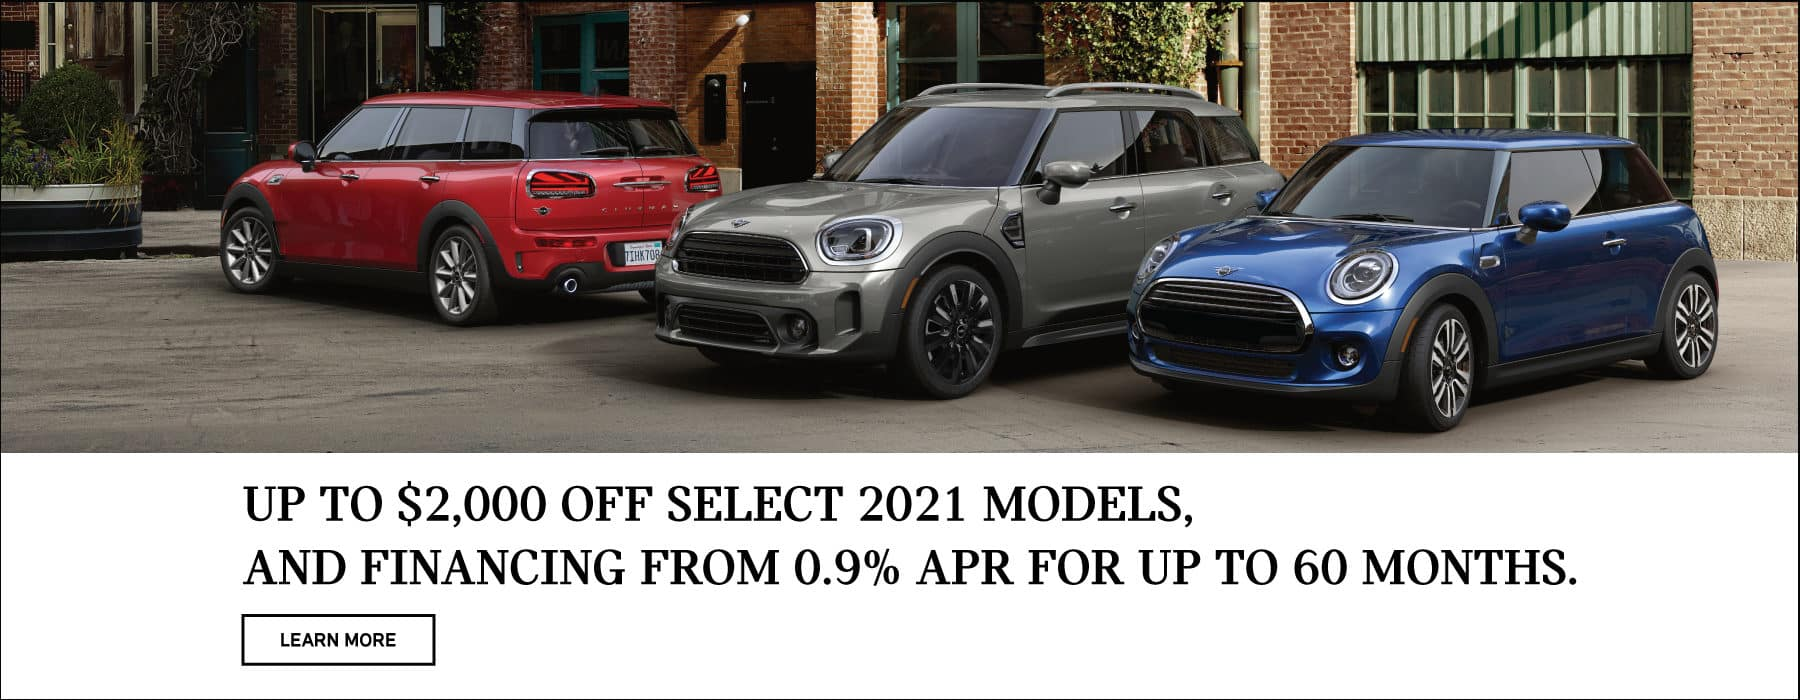 $2,000 off select 2021 models.